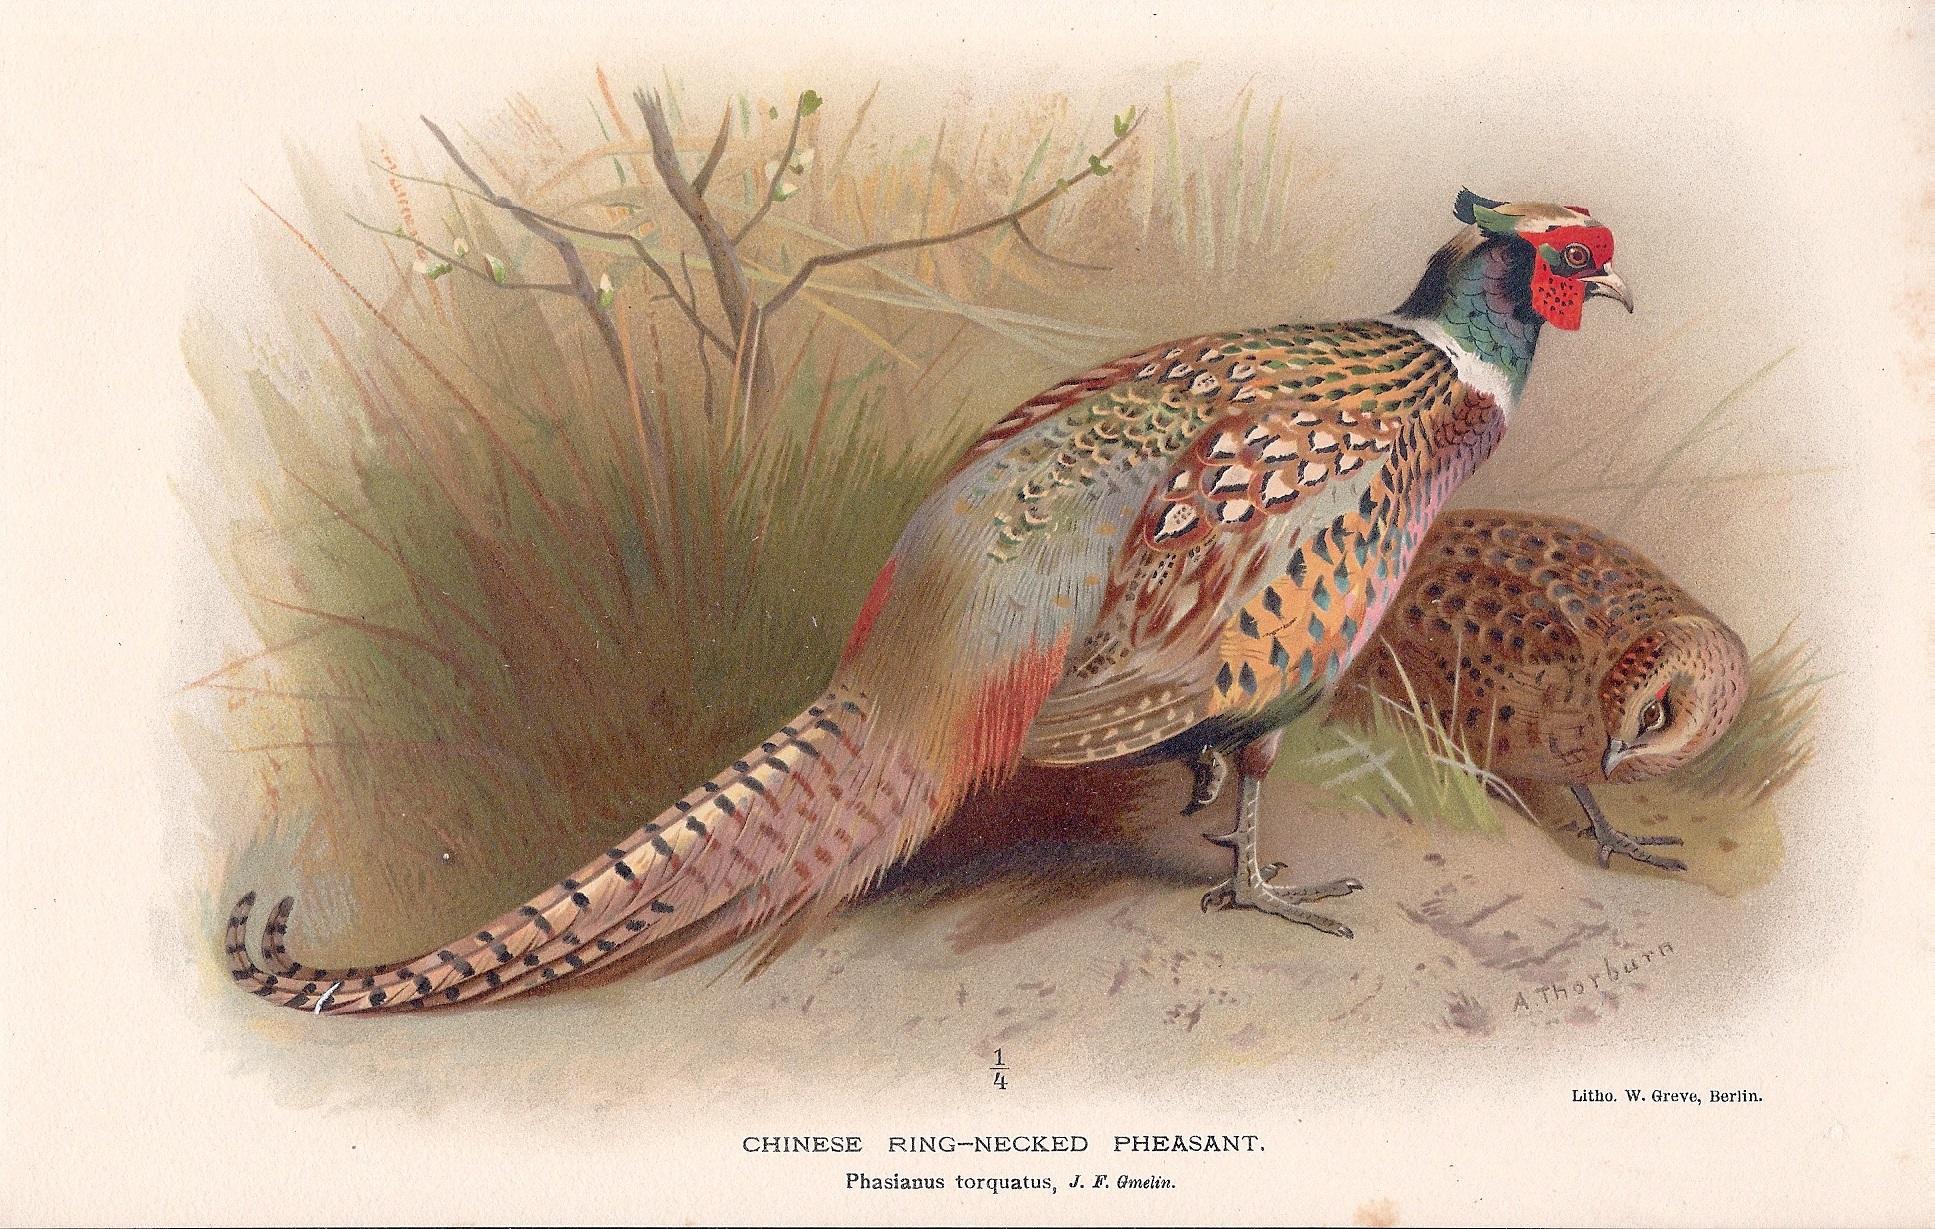 Chinese Ring-Necked Pheasant